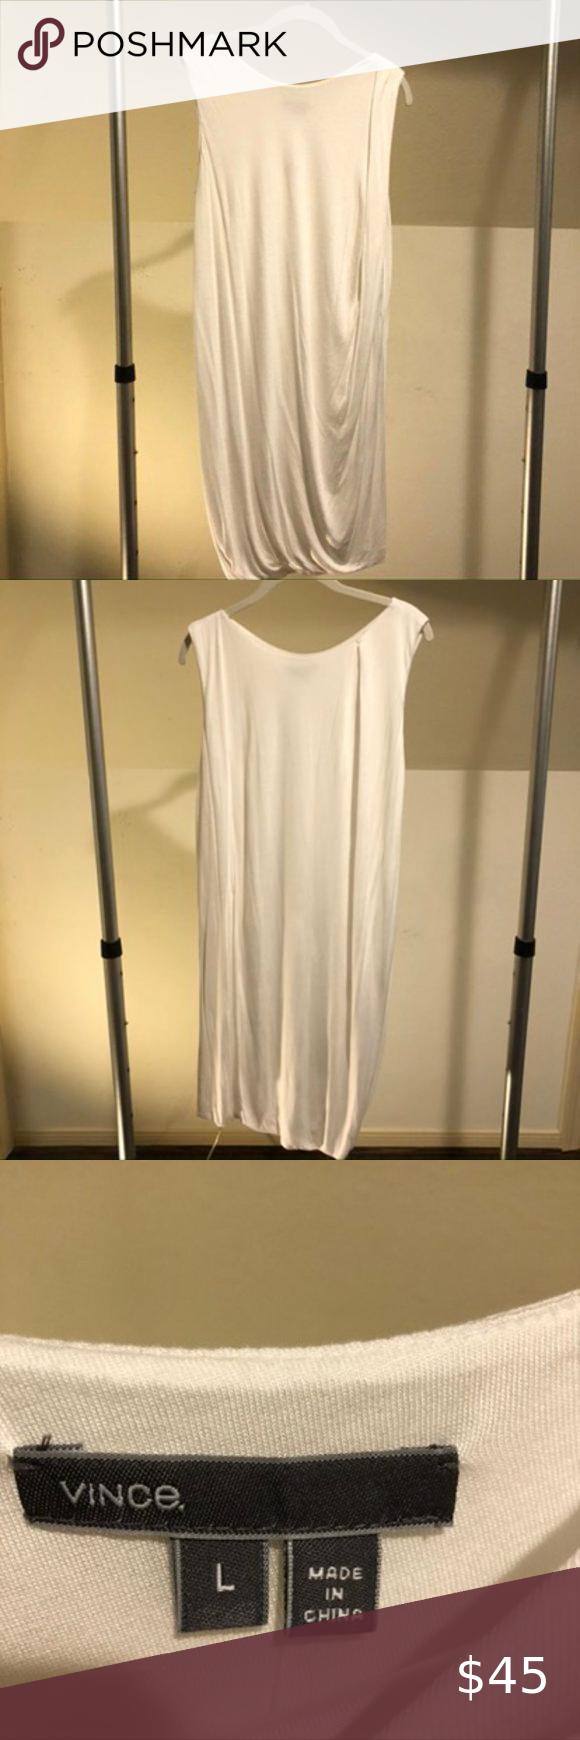 Vince White T Shirt Dress L White Tshirt Dress Vince Dress T Shirt Dress [ 1740 x 580 Pixel ]